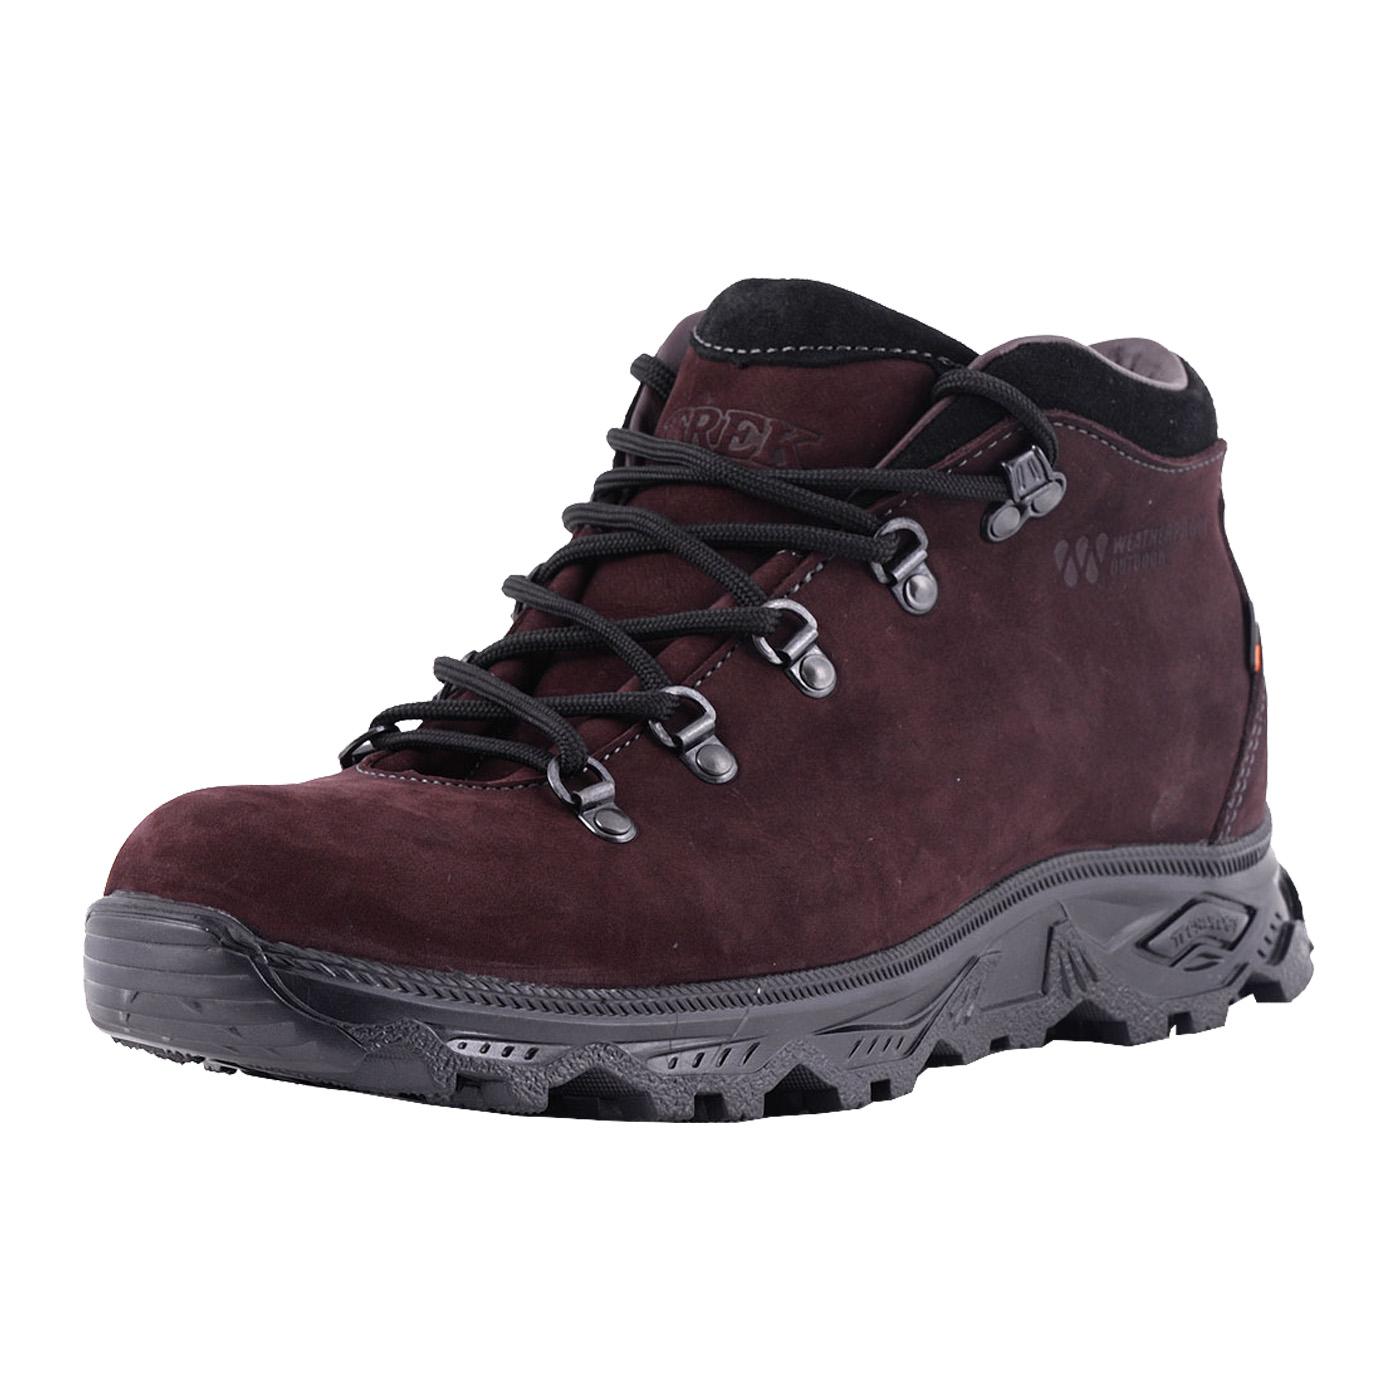 Ботинки мужские TREK Andes3 (капровелюр), Ботинки - арт. 1129390177